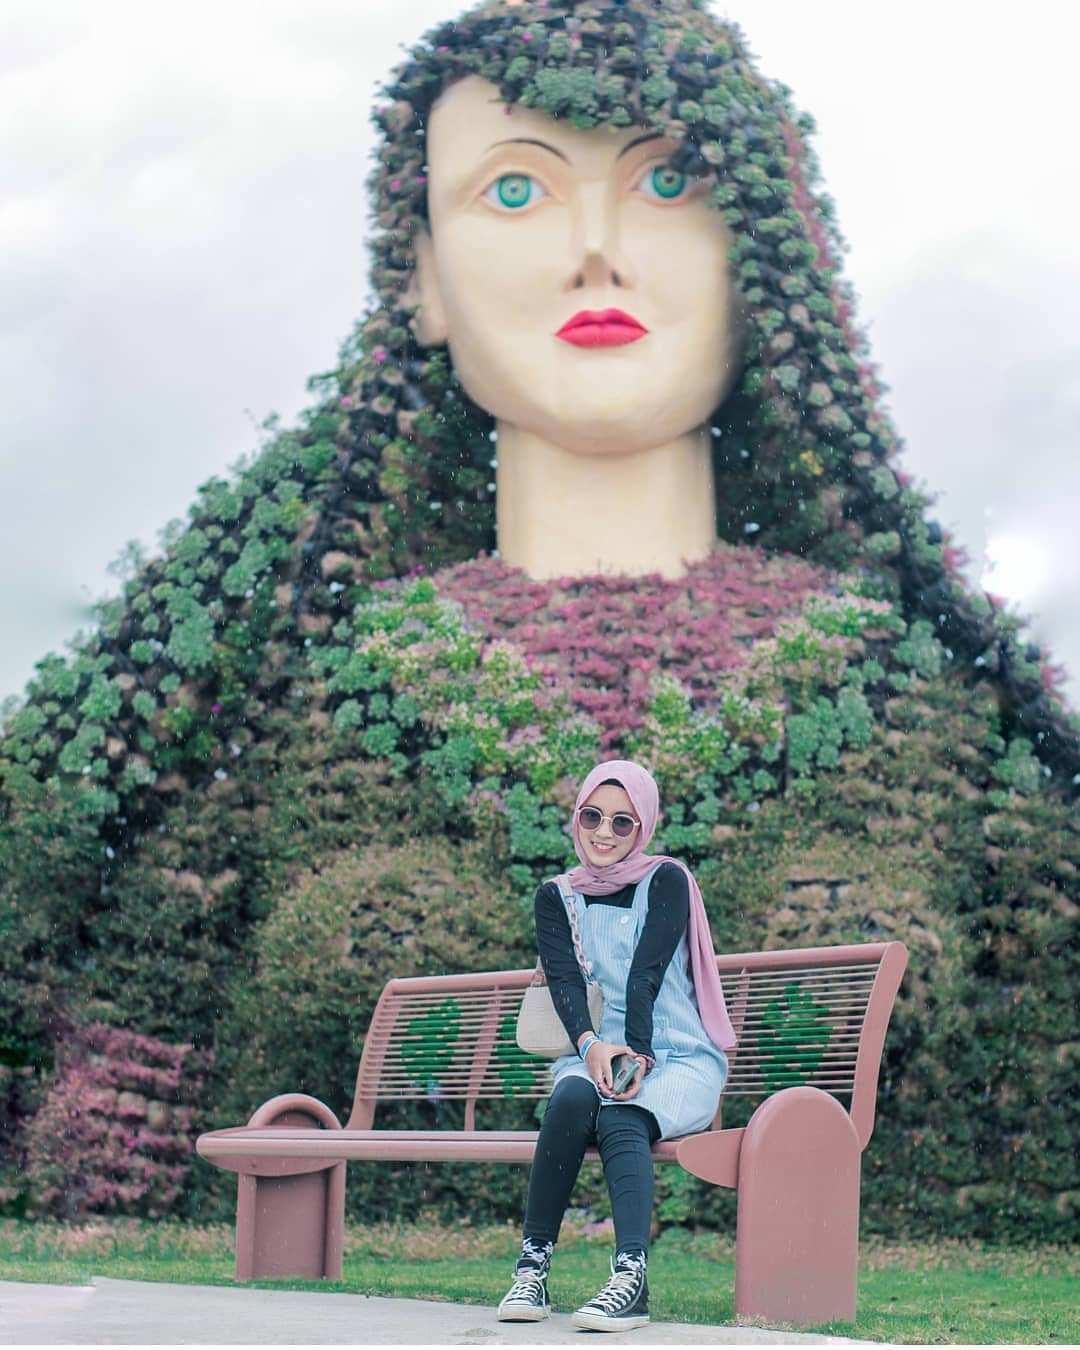 Bunga Berbentuk Puteri di Batu Love Garden Jawa Timur Image From @dewipoel